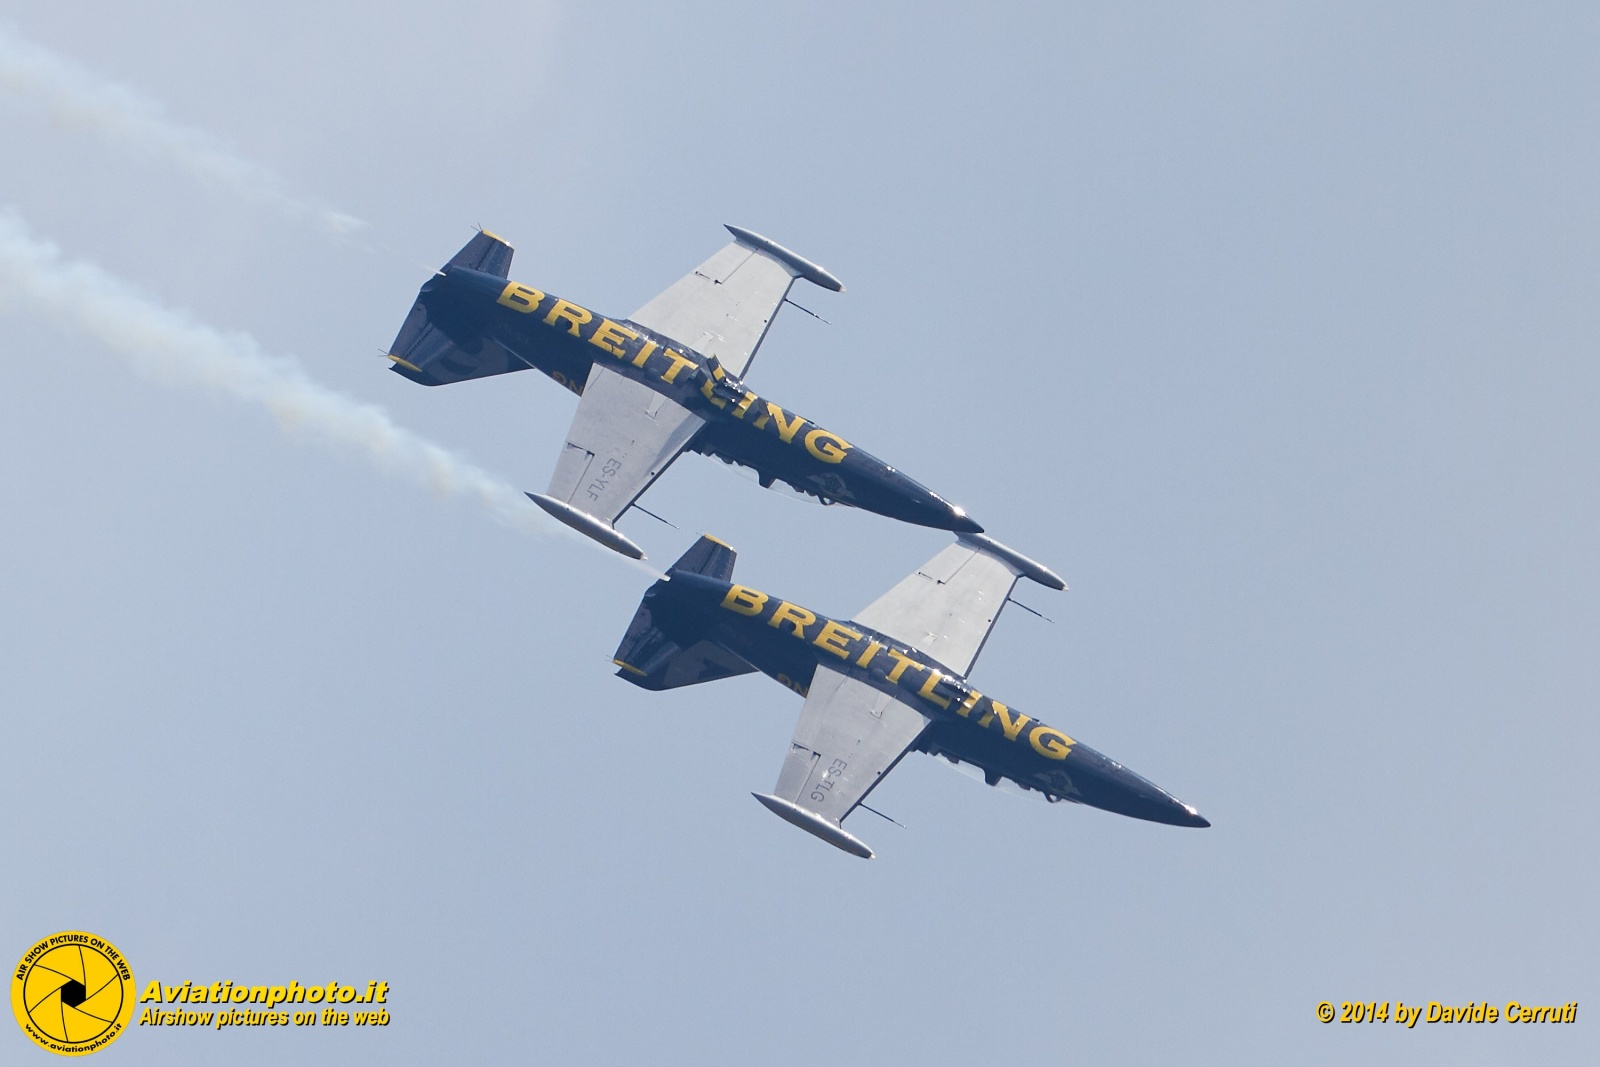 Cielo Aperto - Airshow Locarno